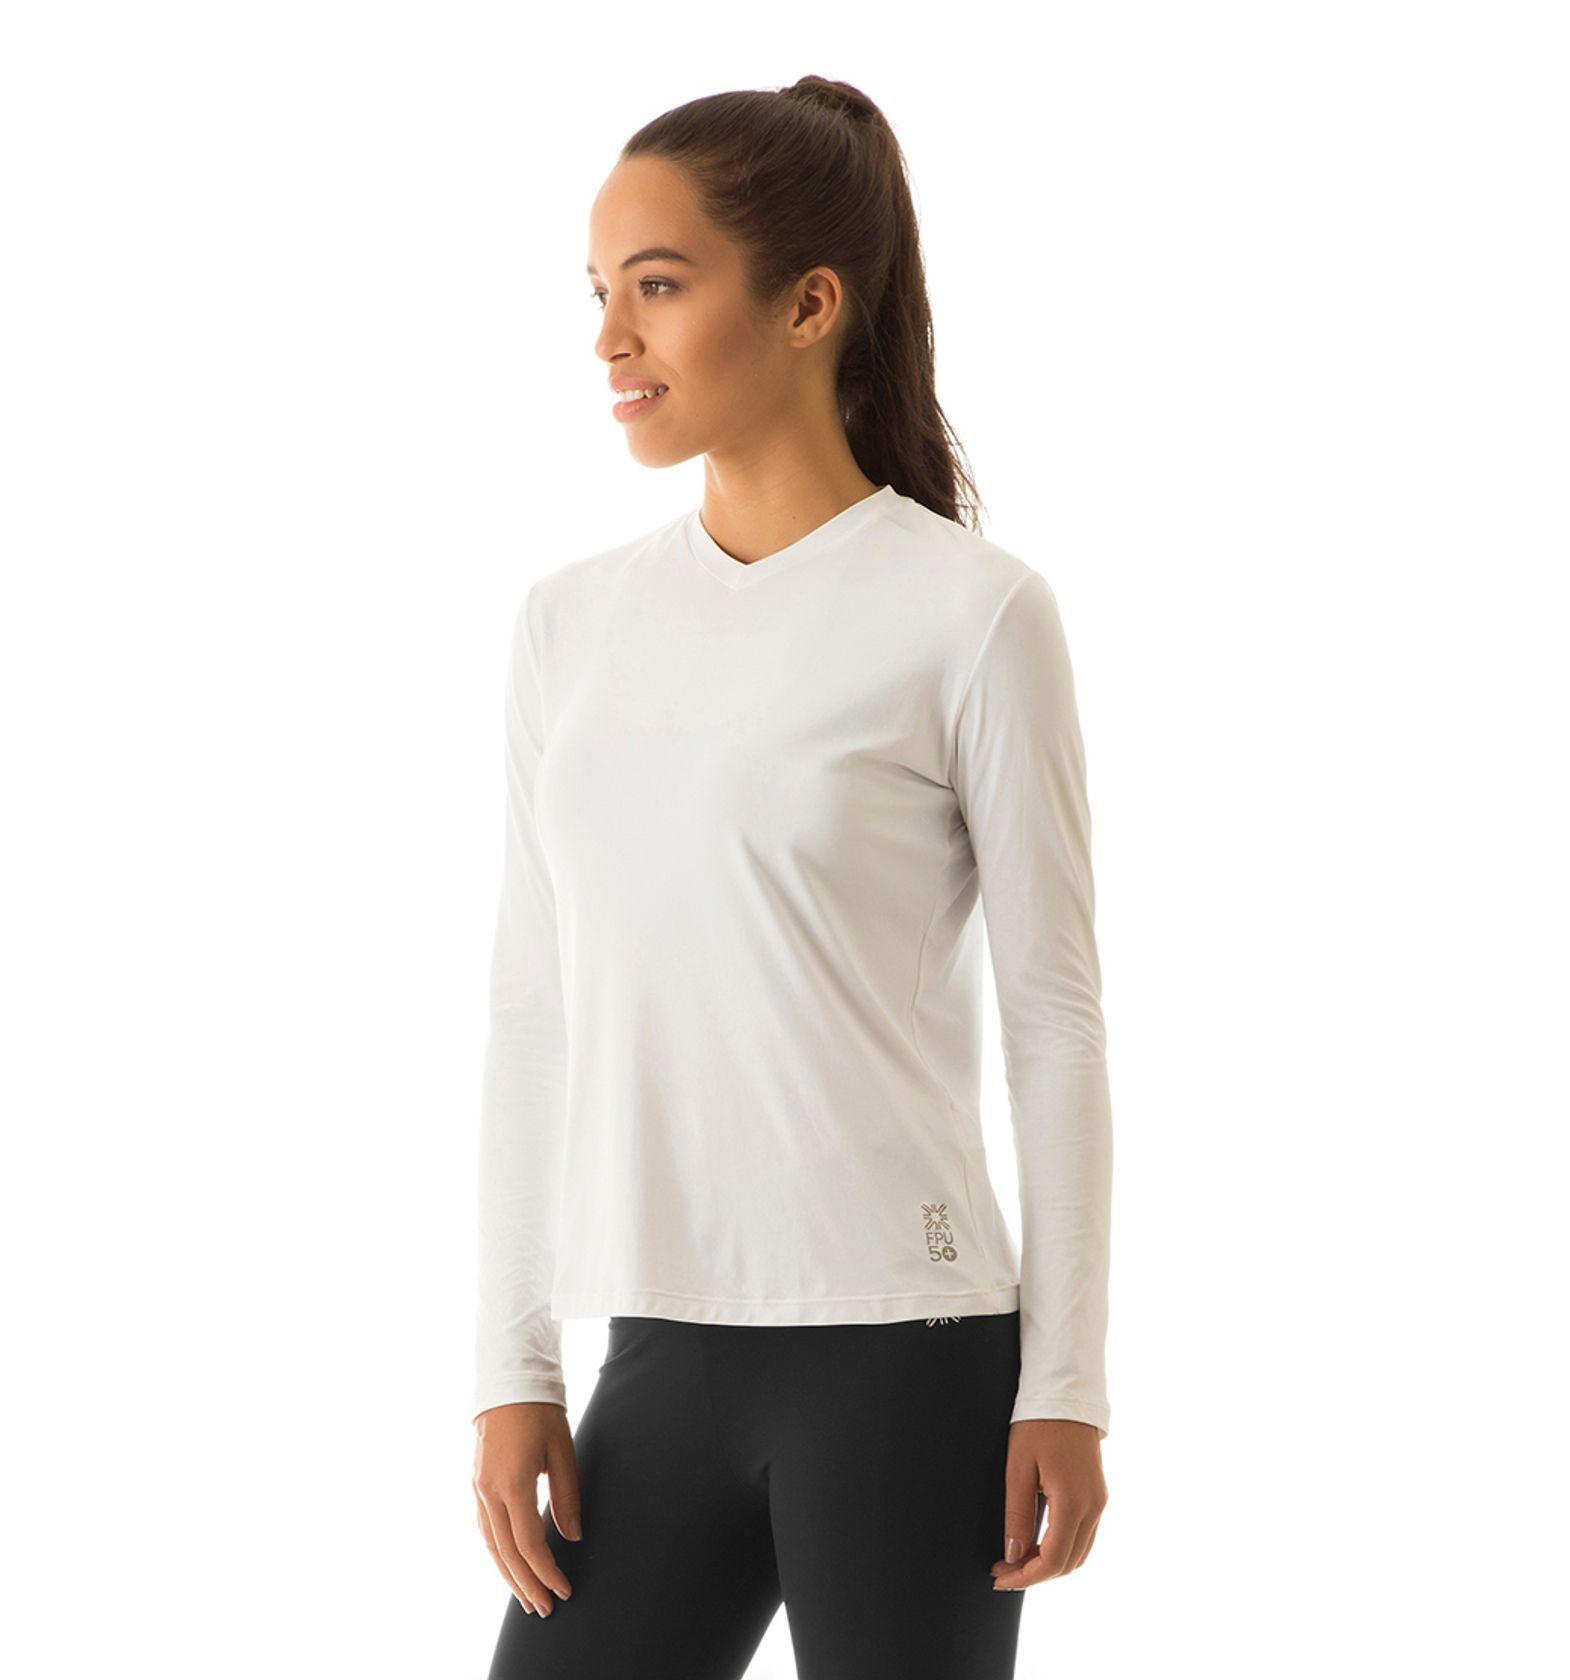 UV LINE Camiseta Sport Fit Manga Longa Feminino Proteção Solar